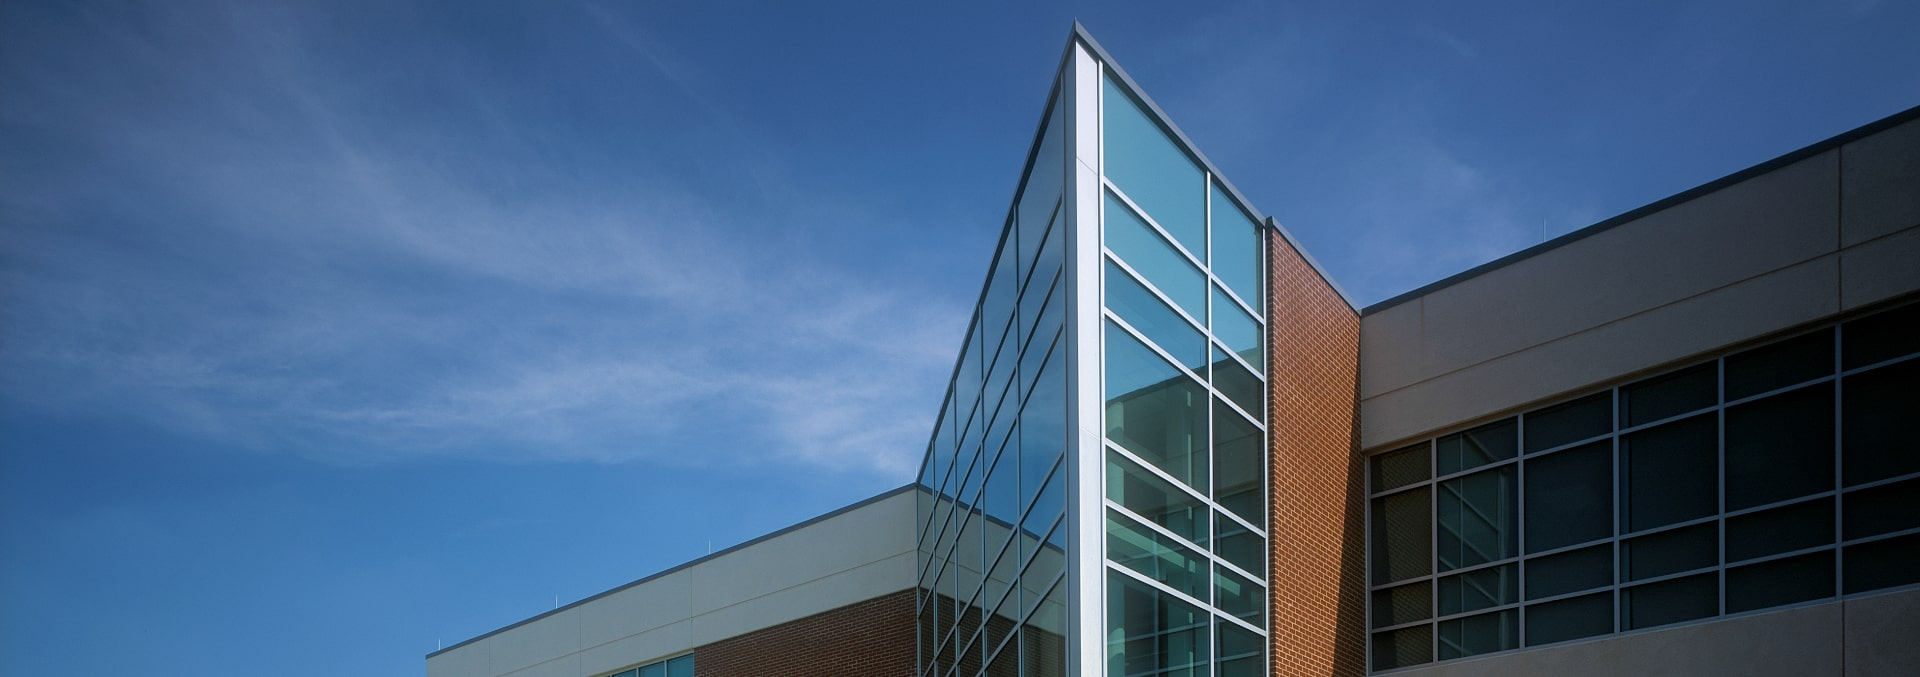 Burgess & Niple - Architecture